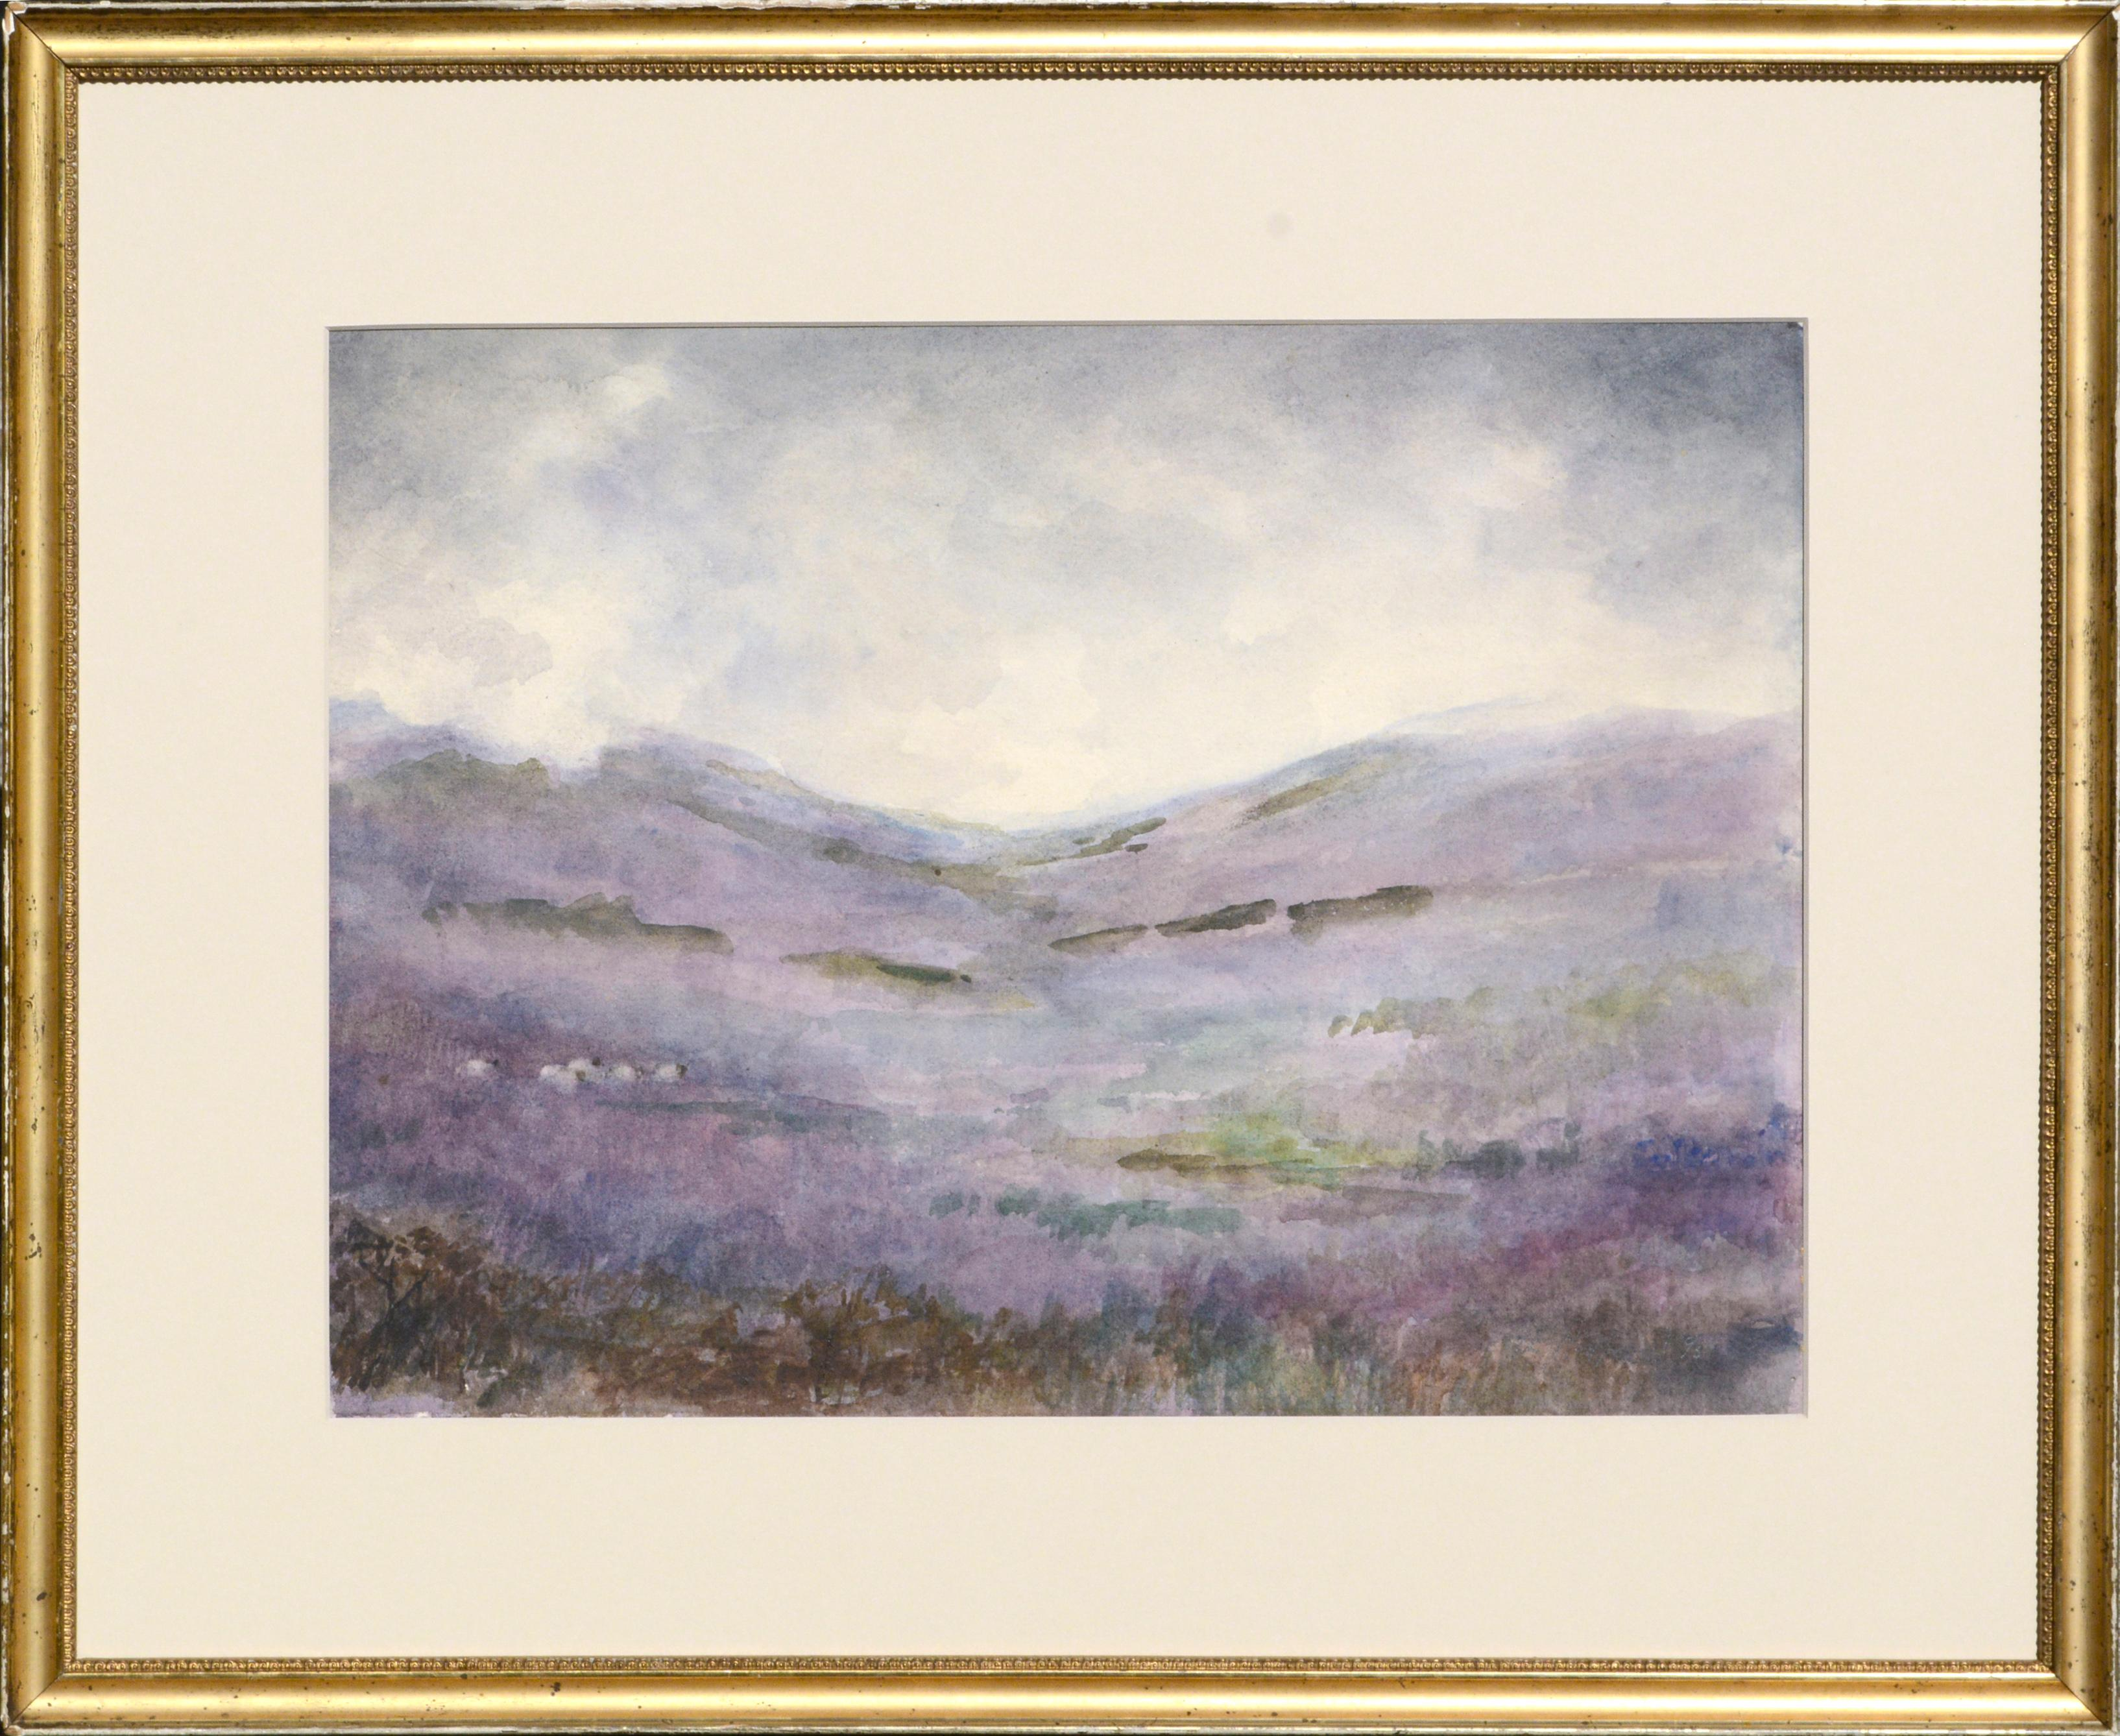 Scottish Hills Near Dunkeld - Late 19th C. Landscape